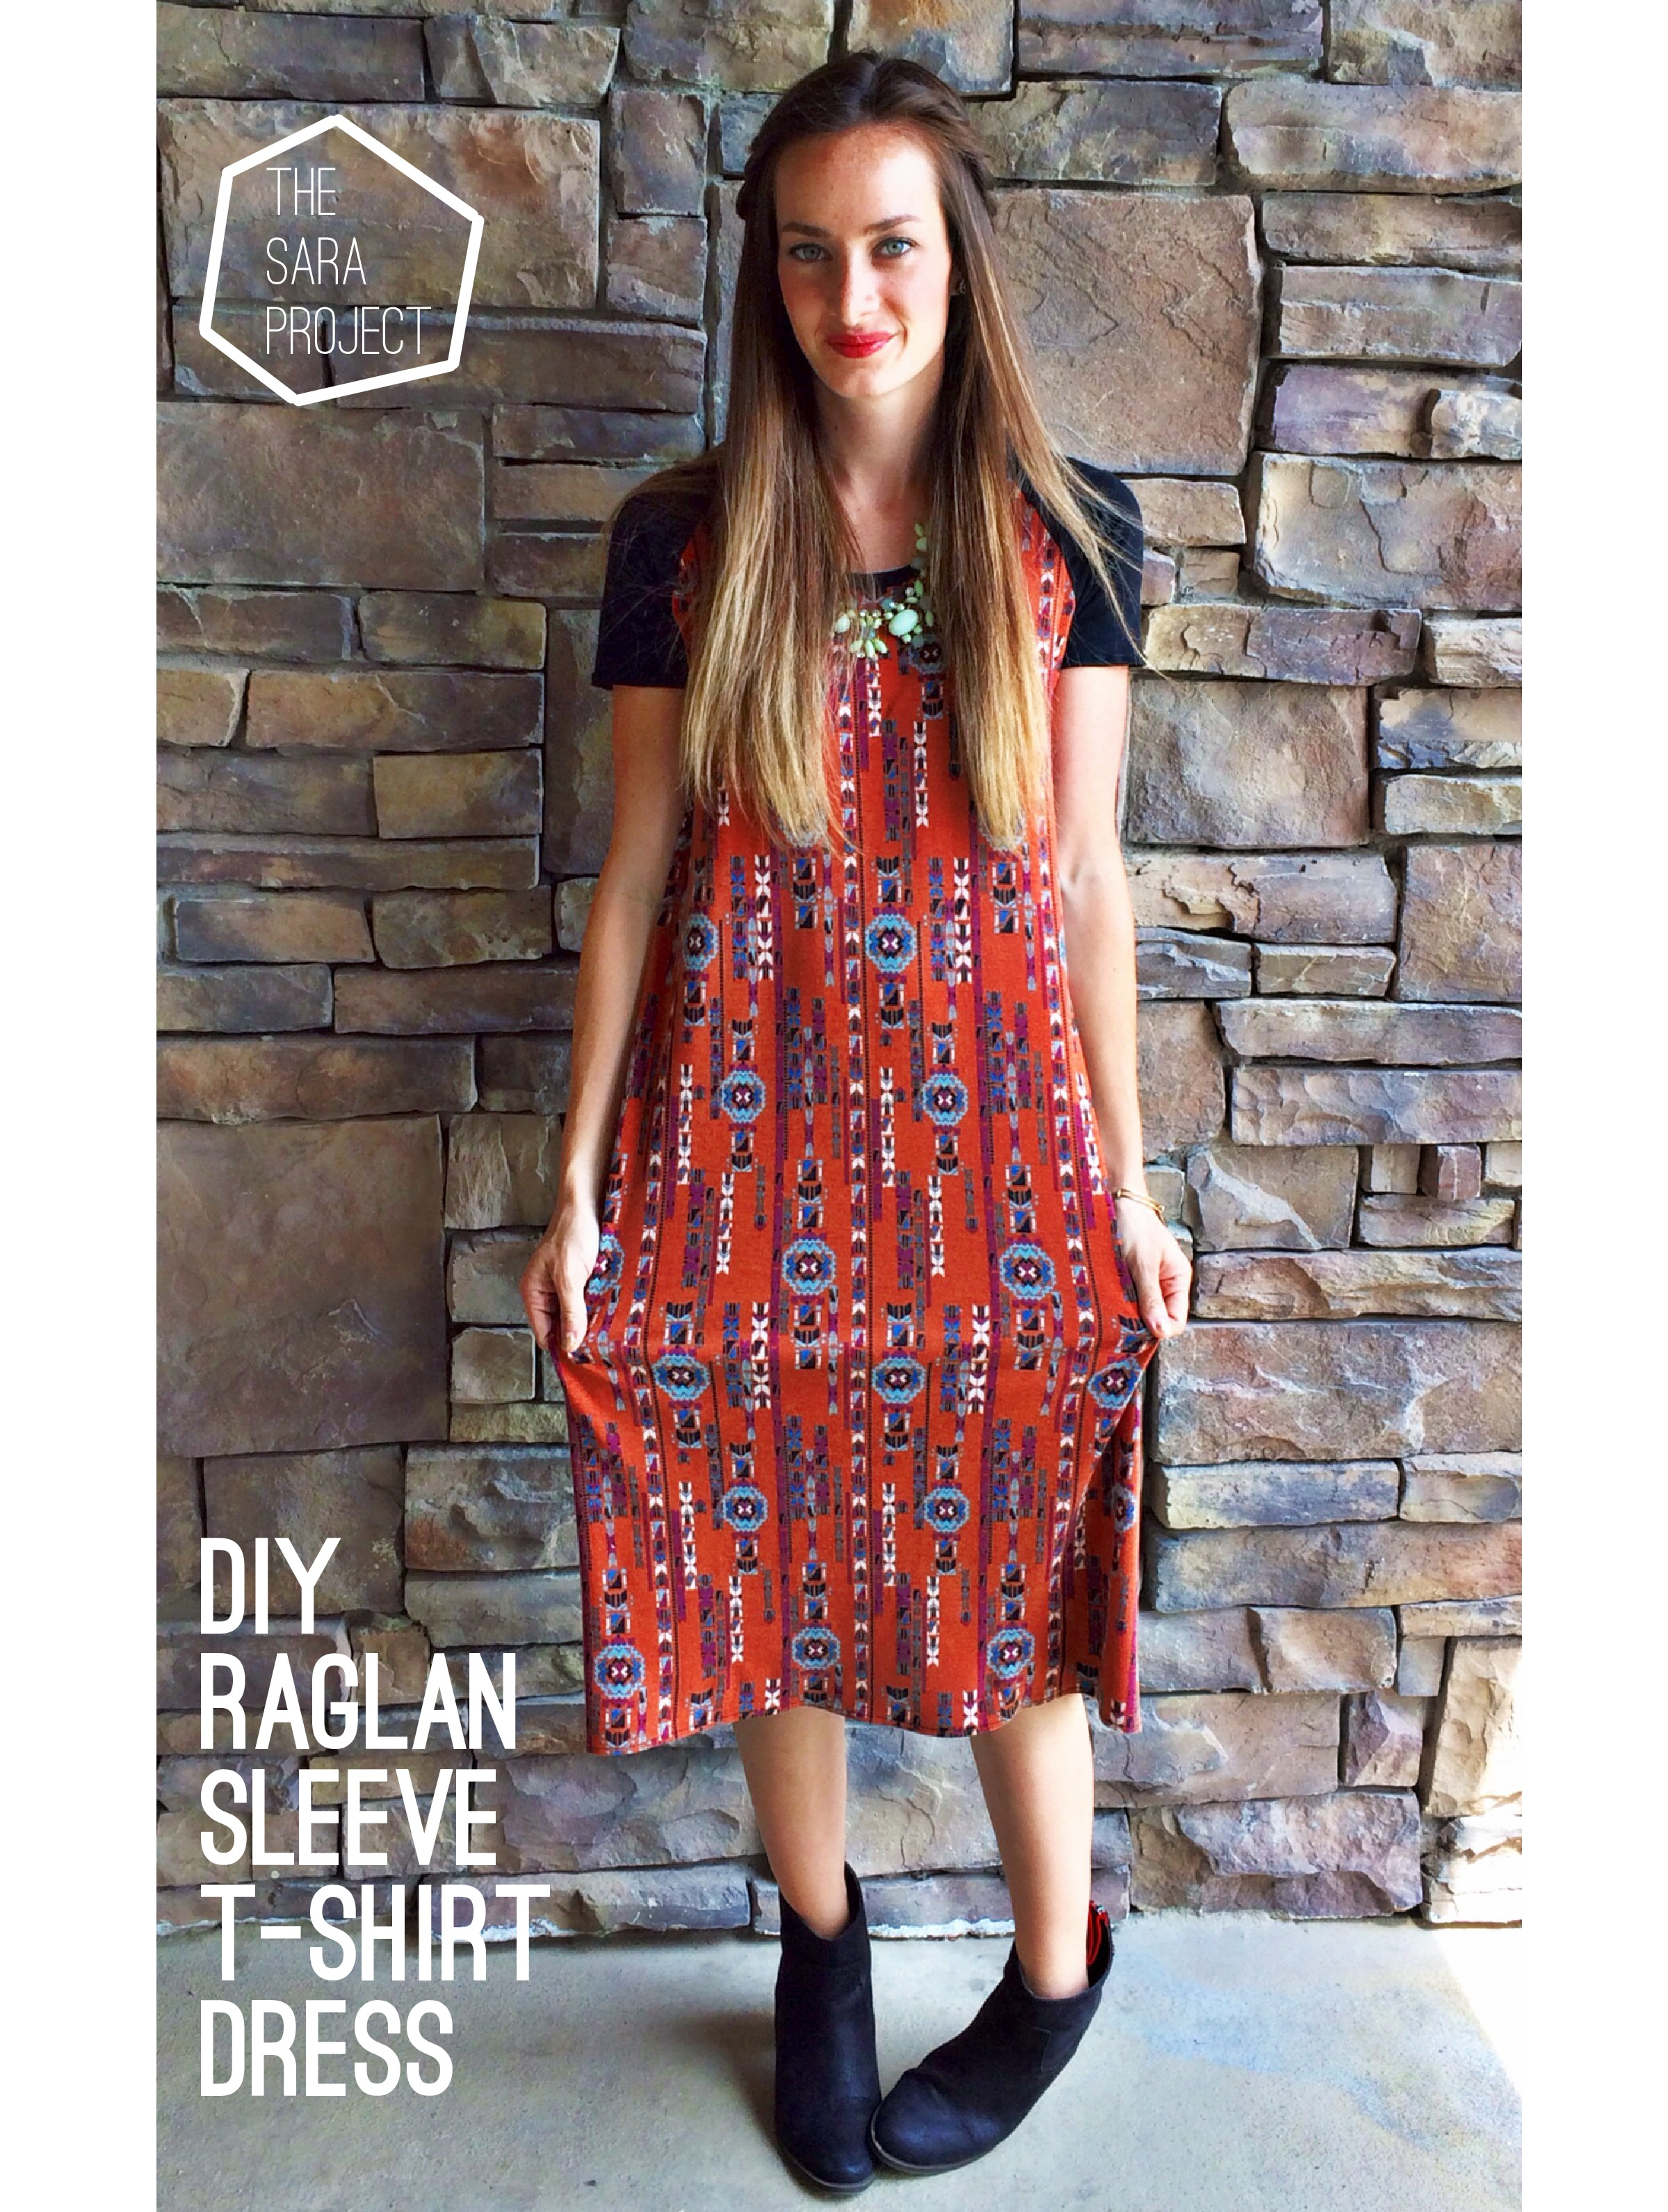 Knit Raglan Sleeve T Shirt Dress Sewing Tutorial The Sara Project